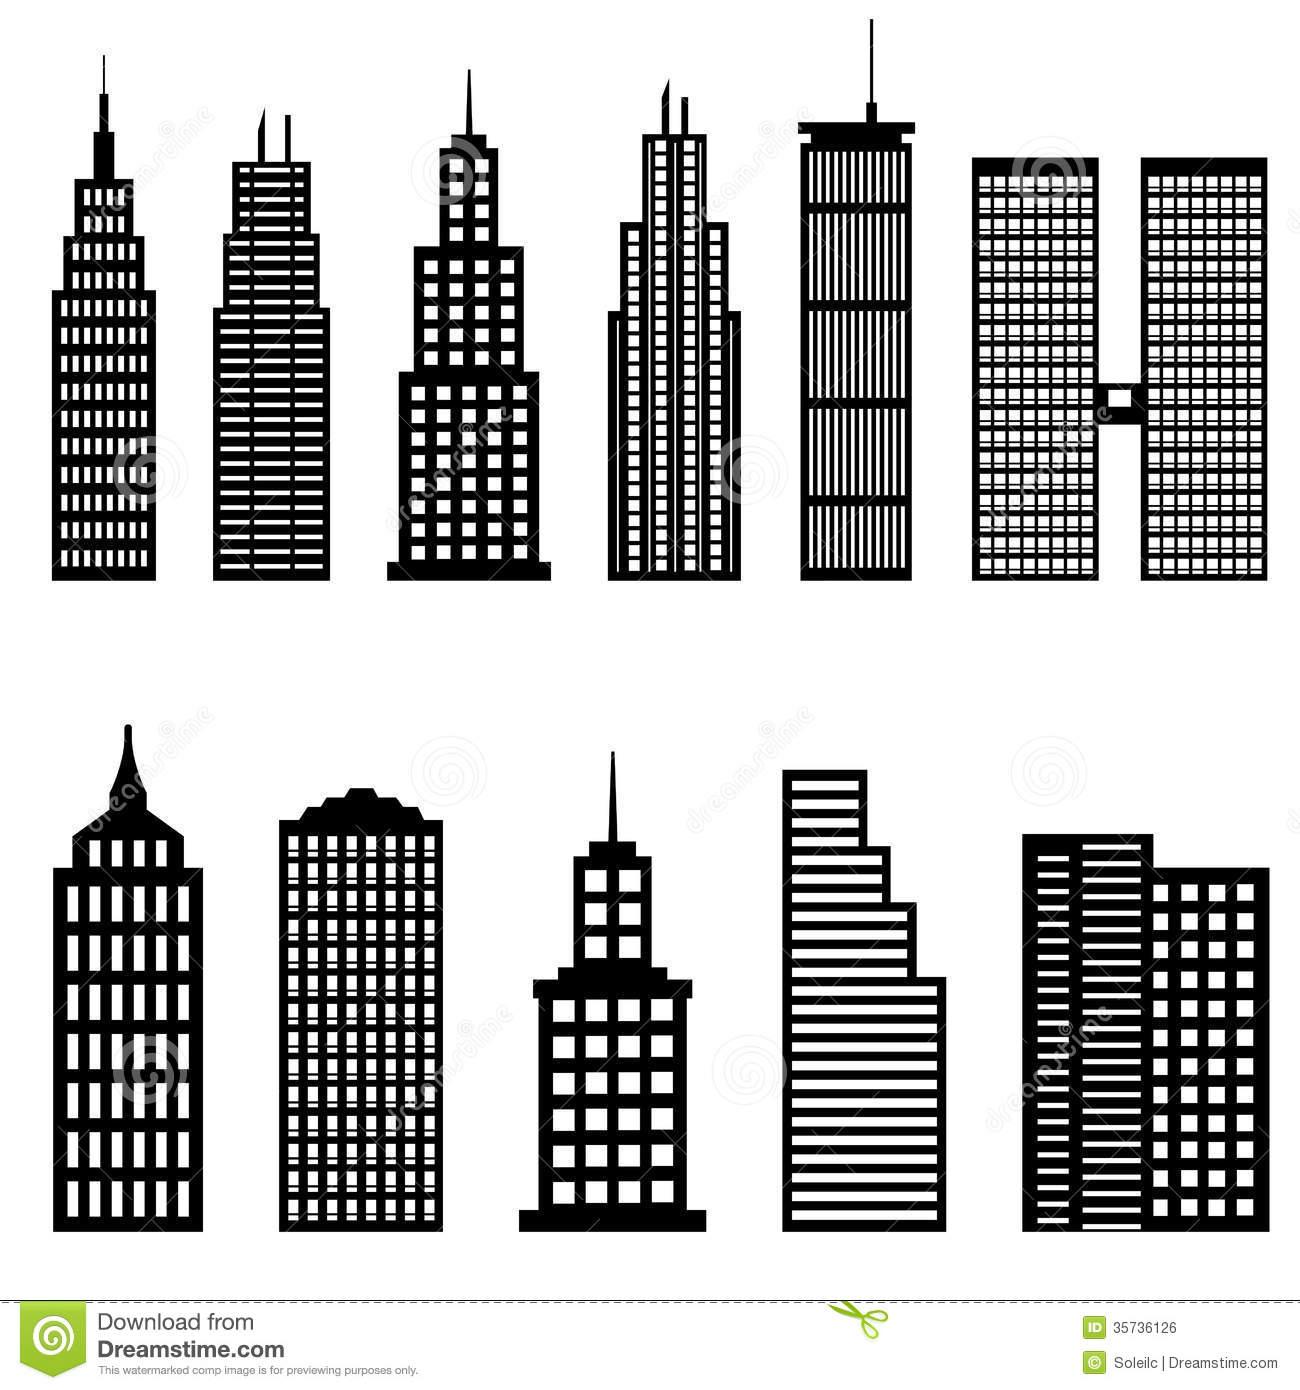 Skyskraper clipart svg free stock Skyscraper clipart black and white 6 » Clipart Station svg free stock